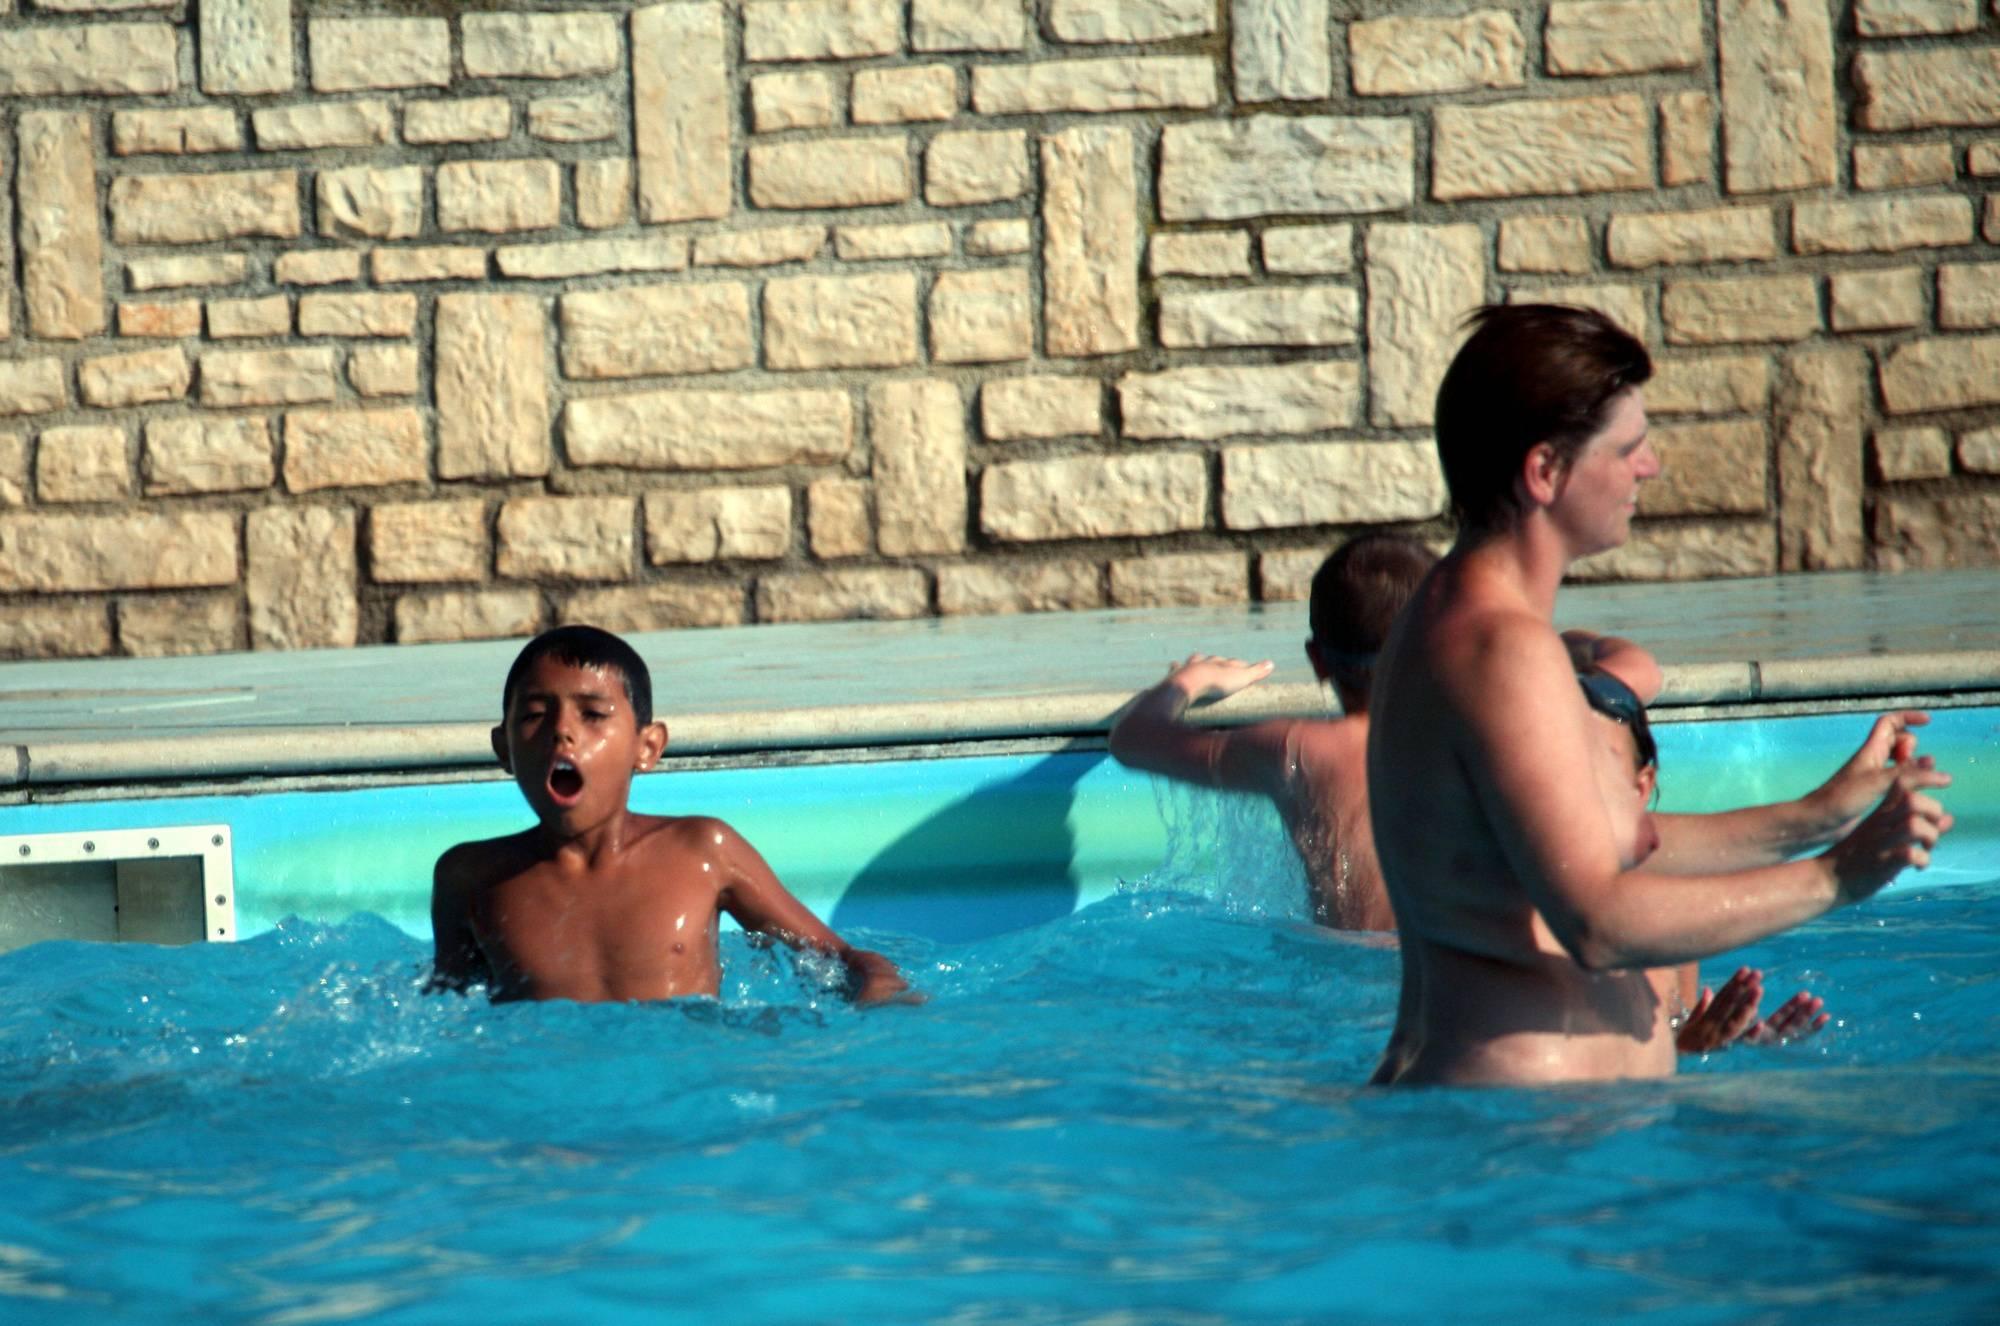 Nudist In-Pool Assortment - 4